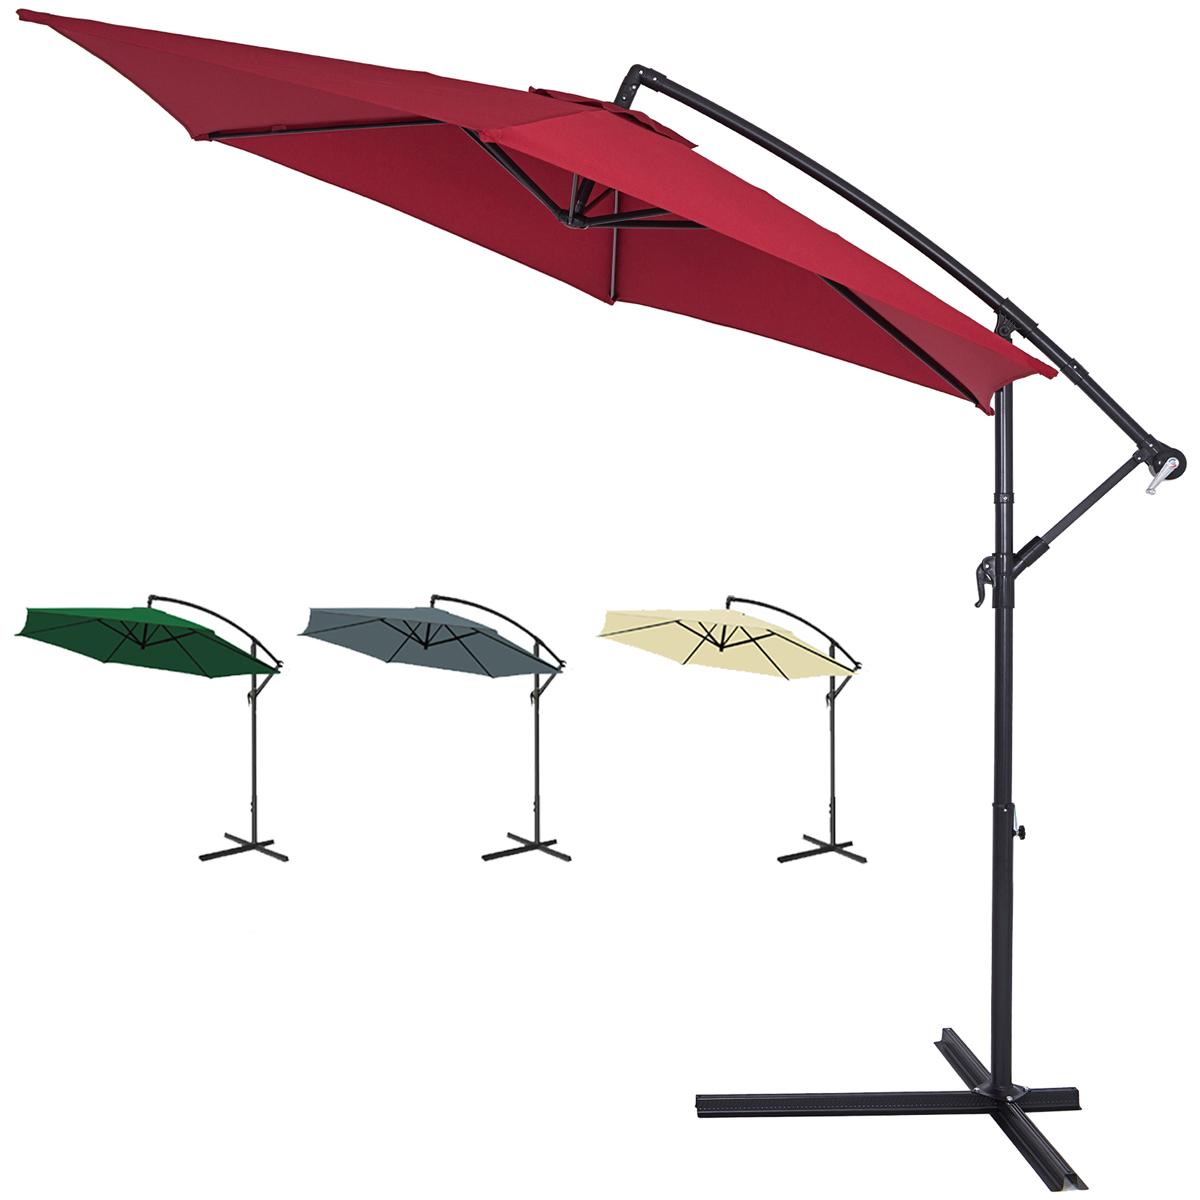 large garden sun parasol 3m shade crank handle hanging. Black Bedroom Furniture Sets. Home Design Ideas